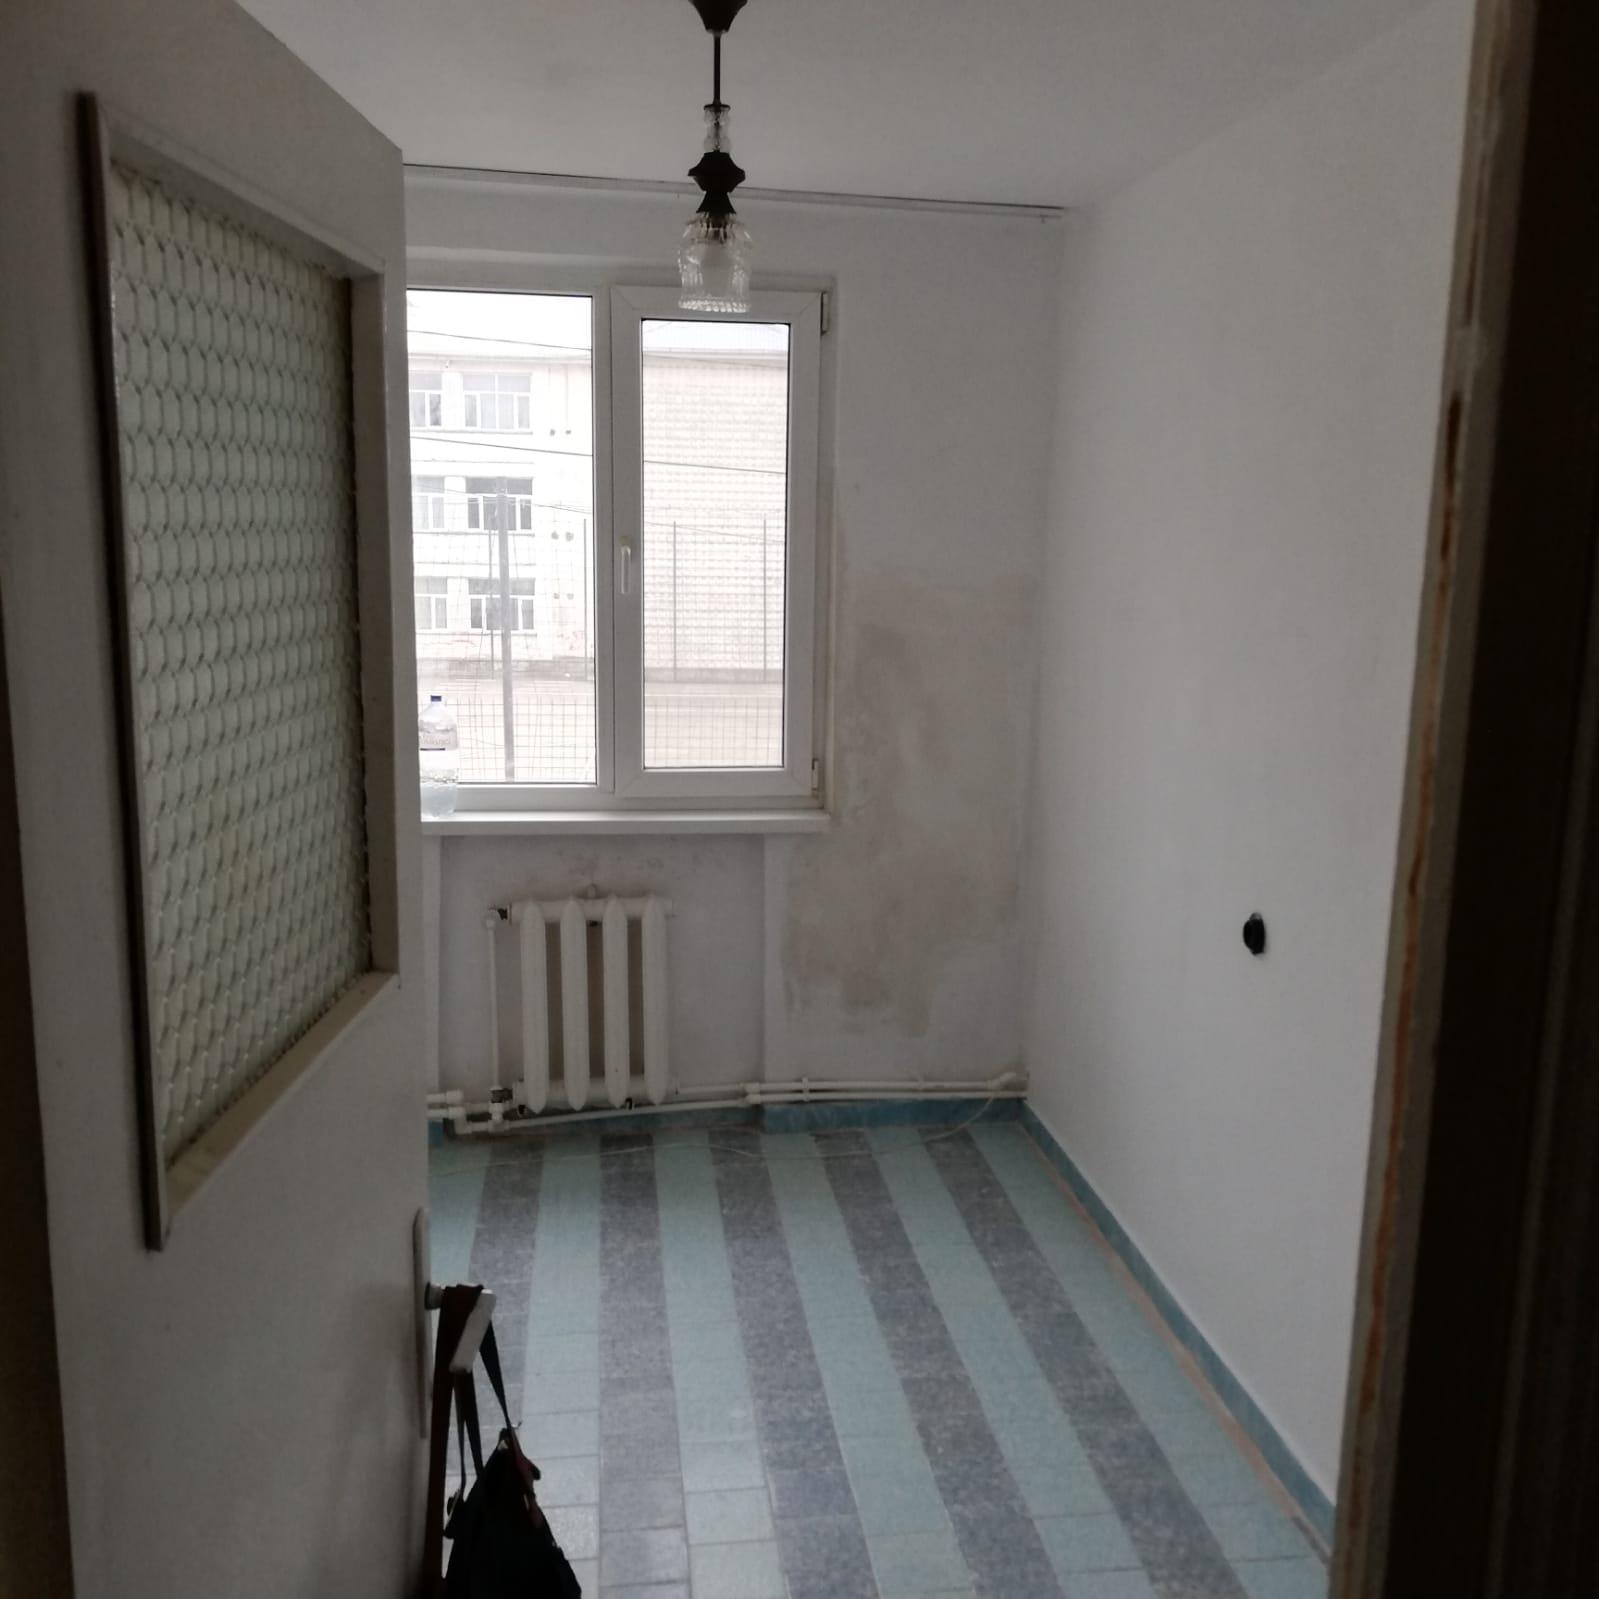 Chirie apartament 3 camere Roman